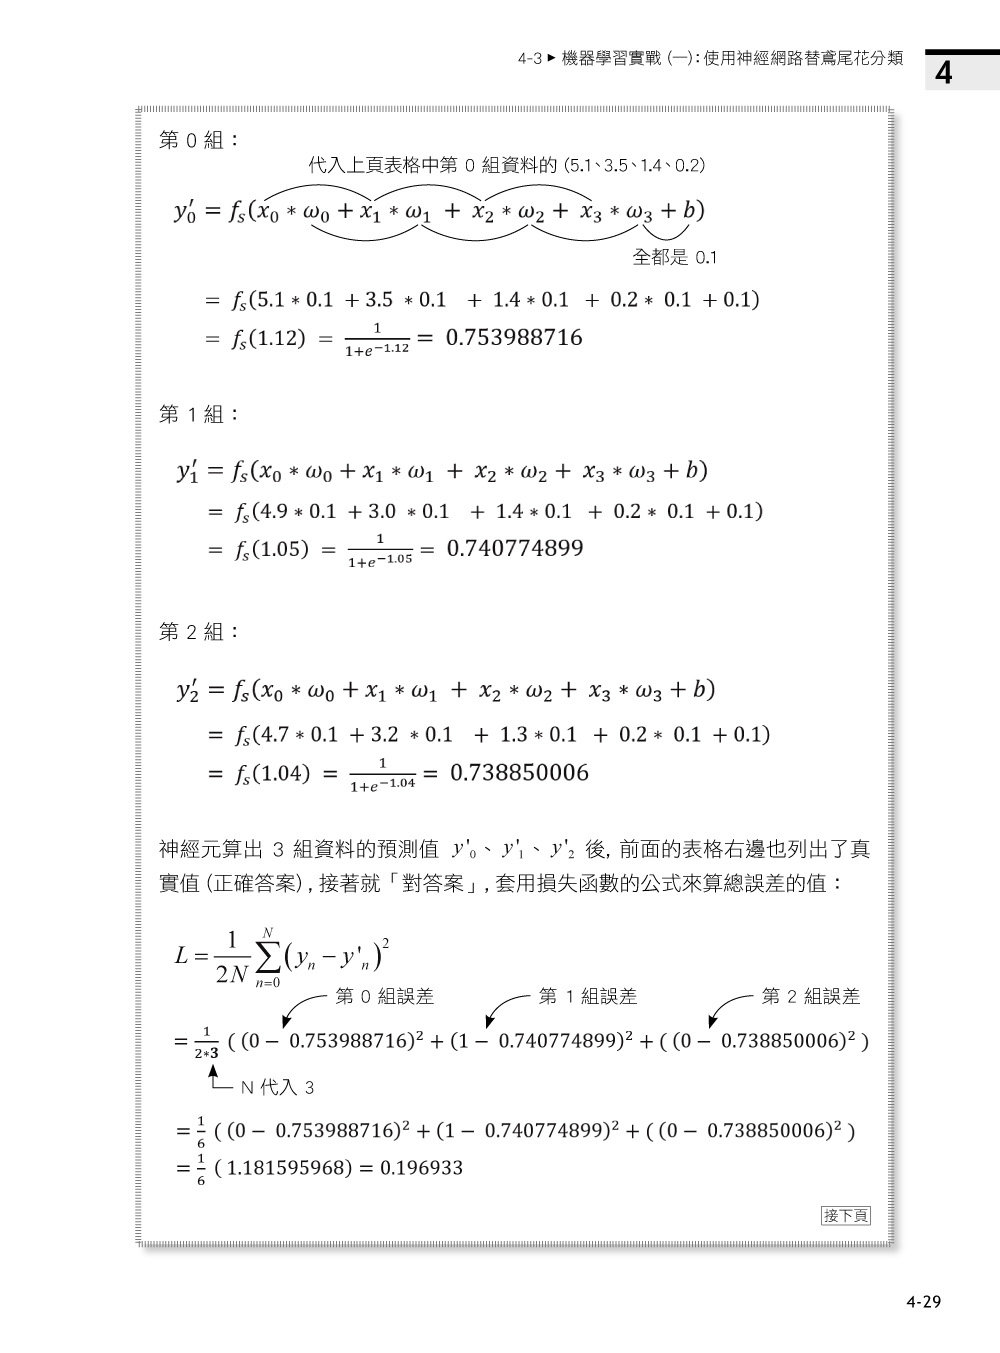 NumPy 高速運算徹底解說 - 六行寫一隻程式?你真懂深度學習?手工算給你看!-preview-5